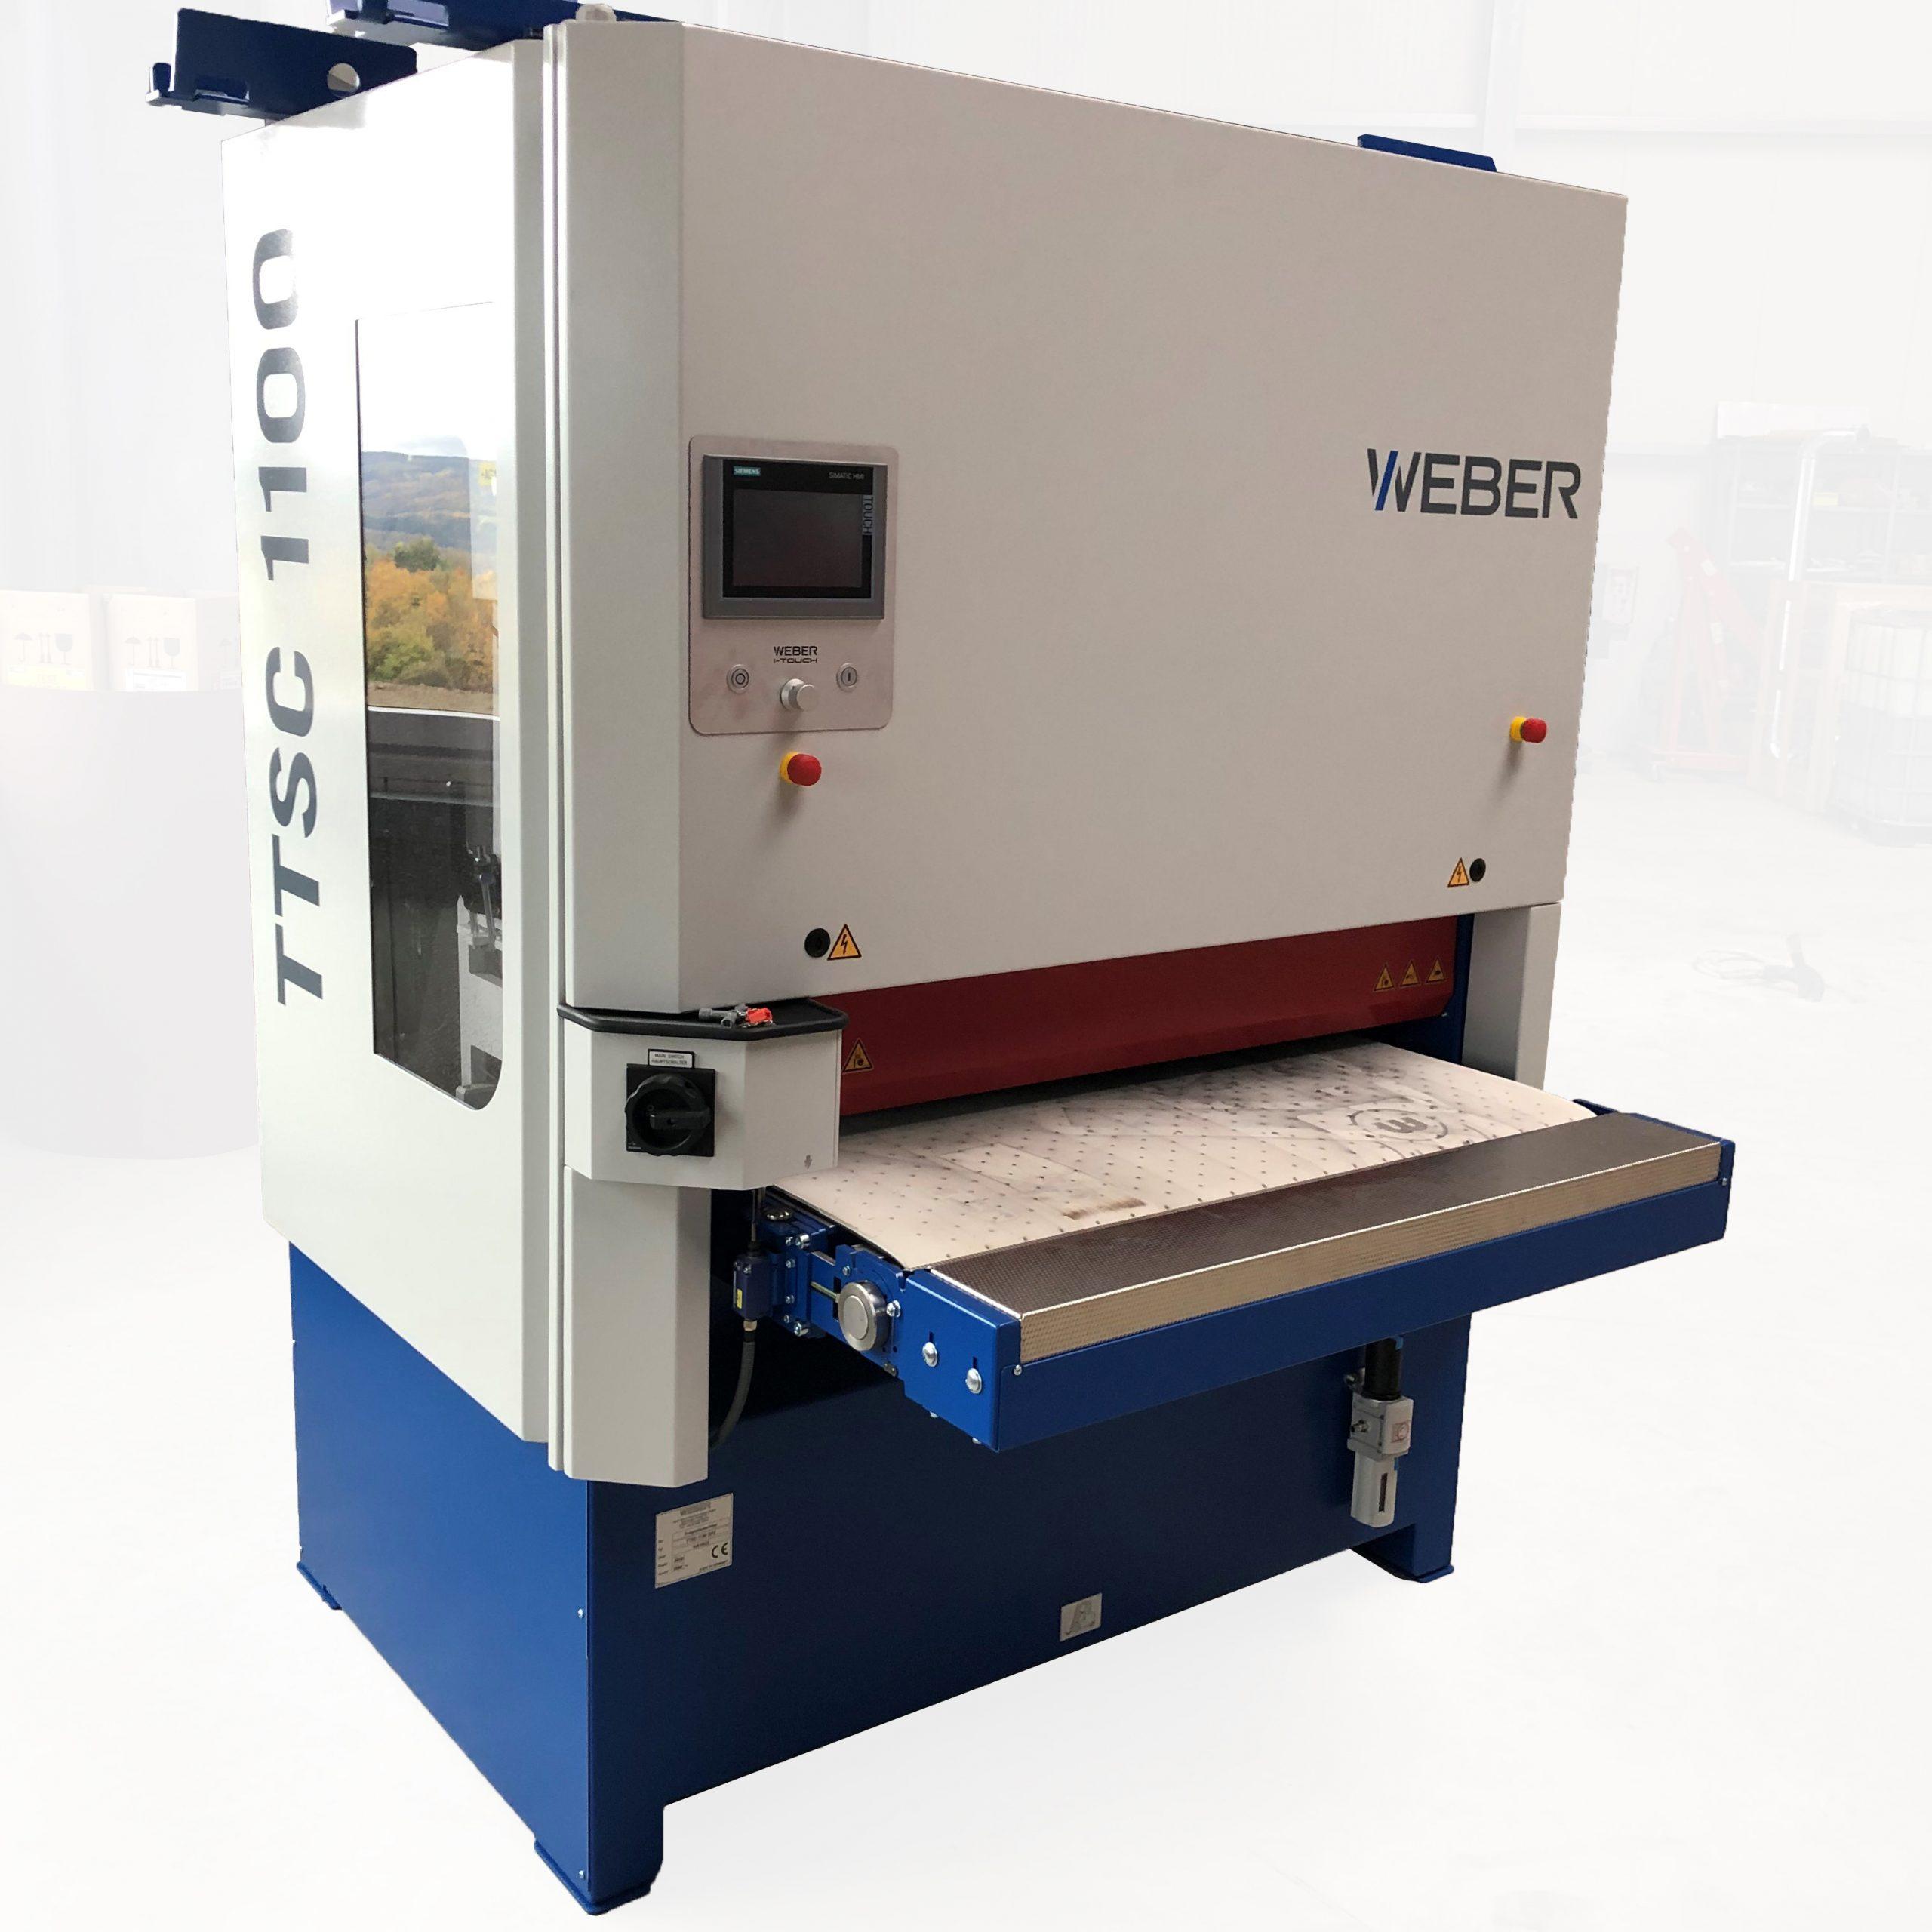 WEBER TTSC 1100 Entgratschleifmaschine